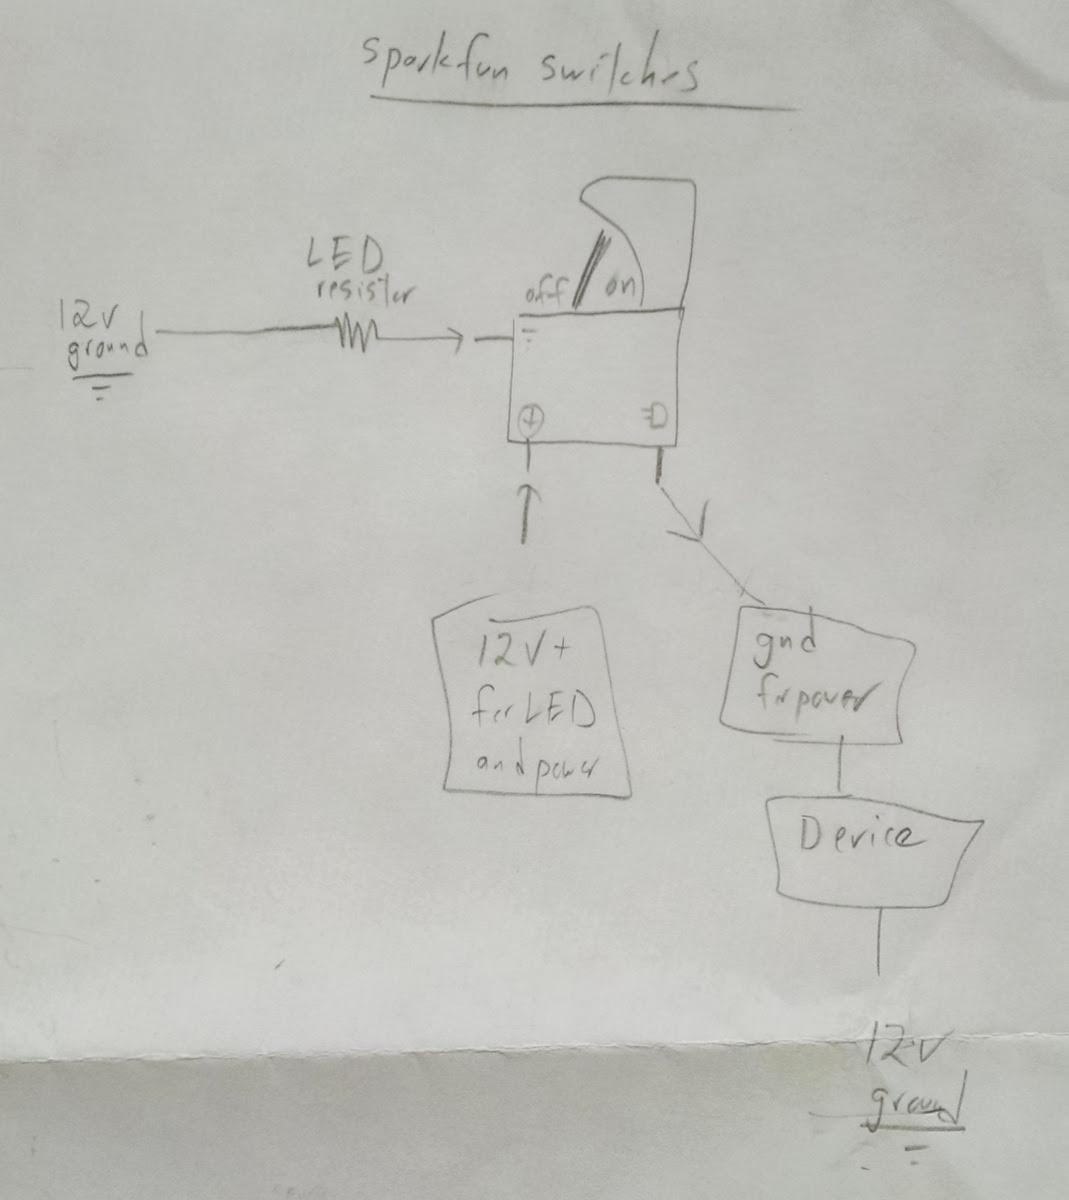 12v Illuminated Switch Wiring Diagram